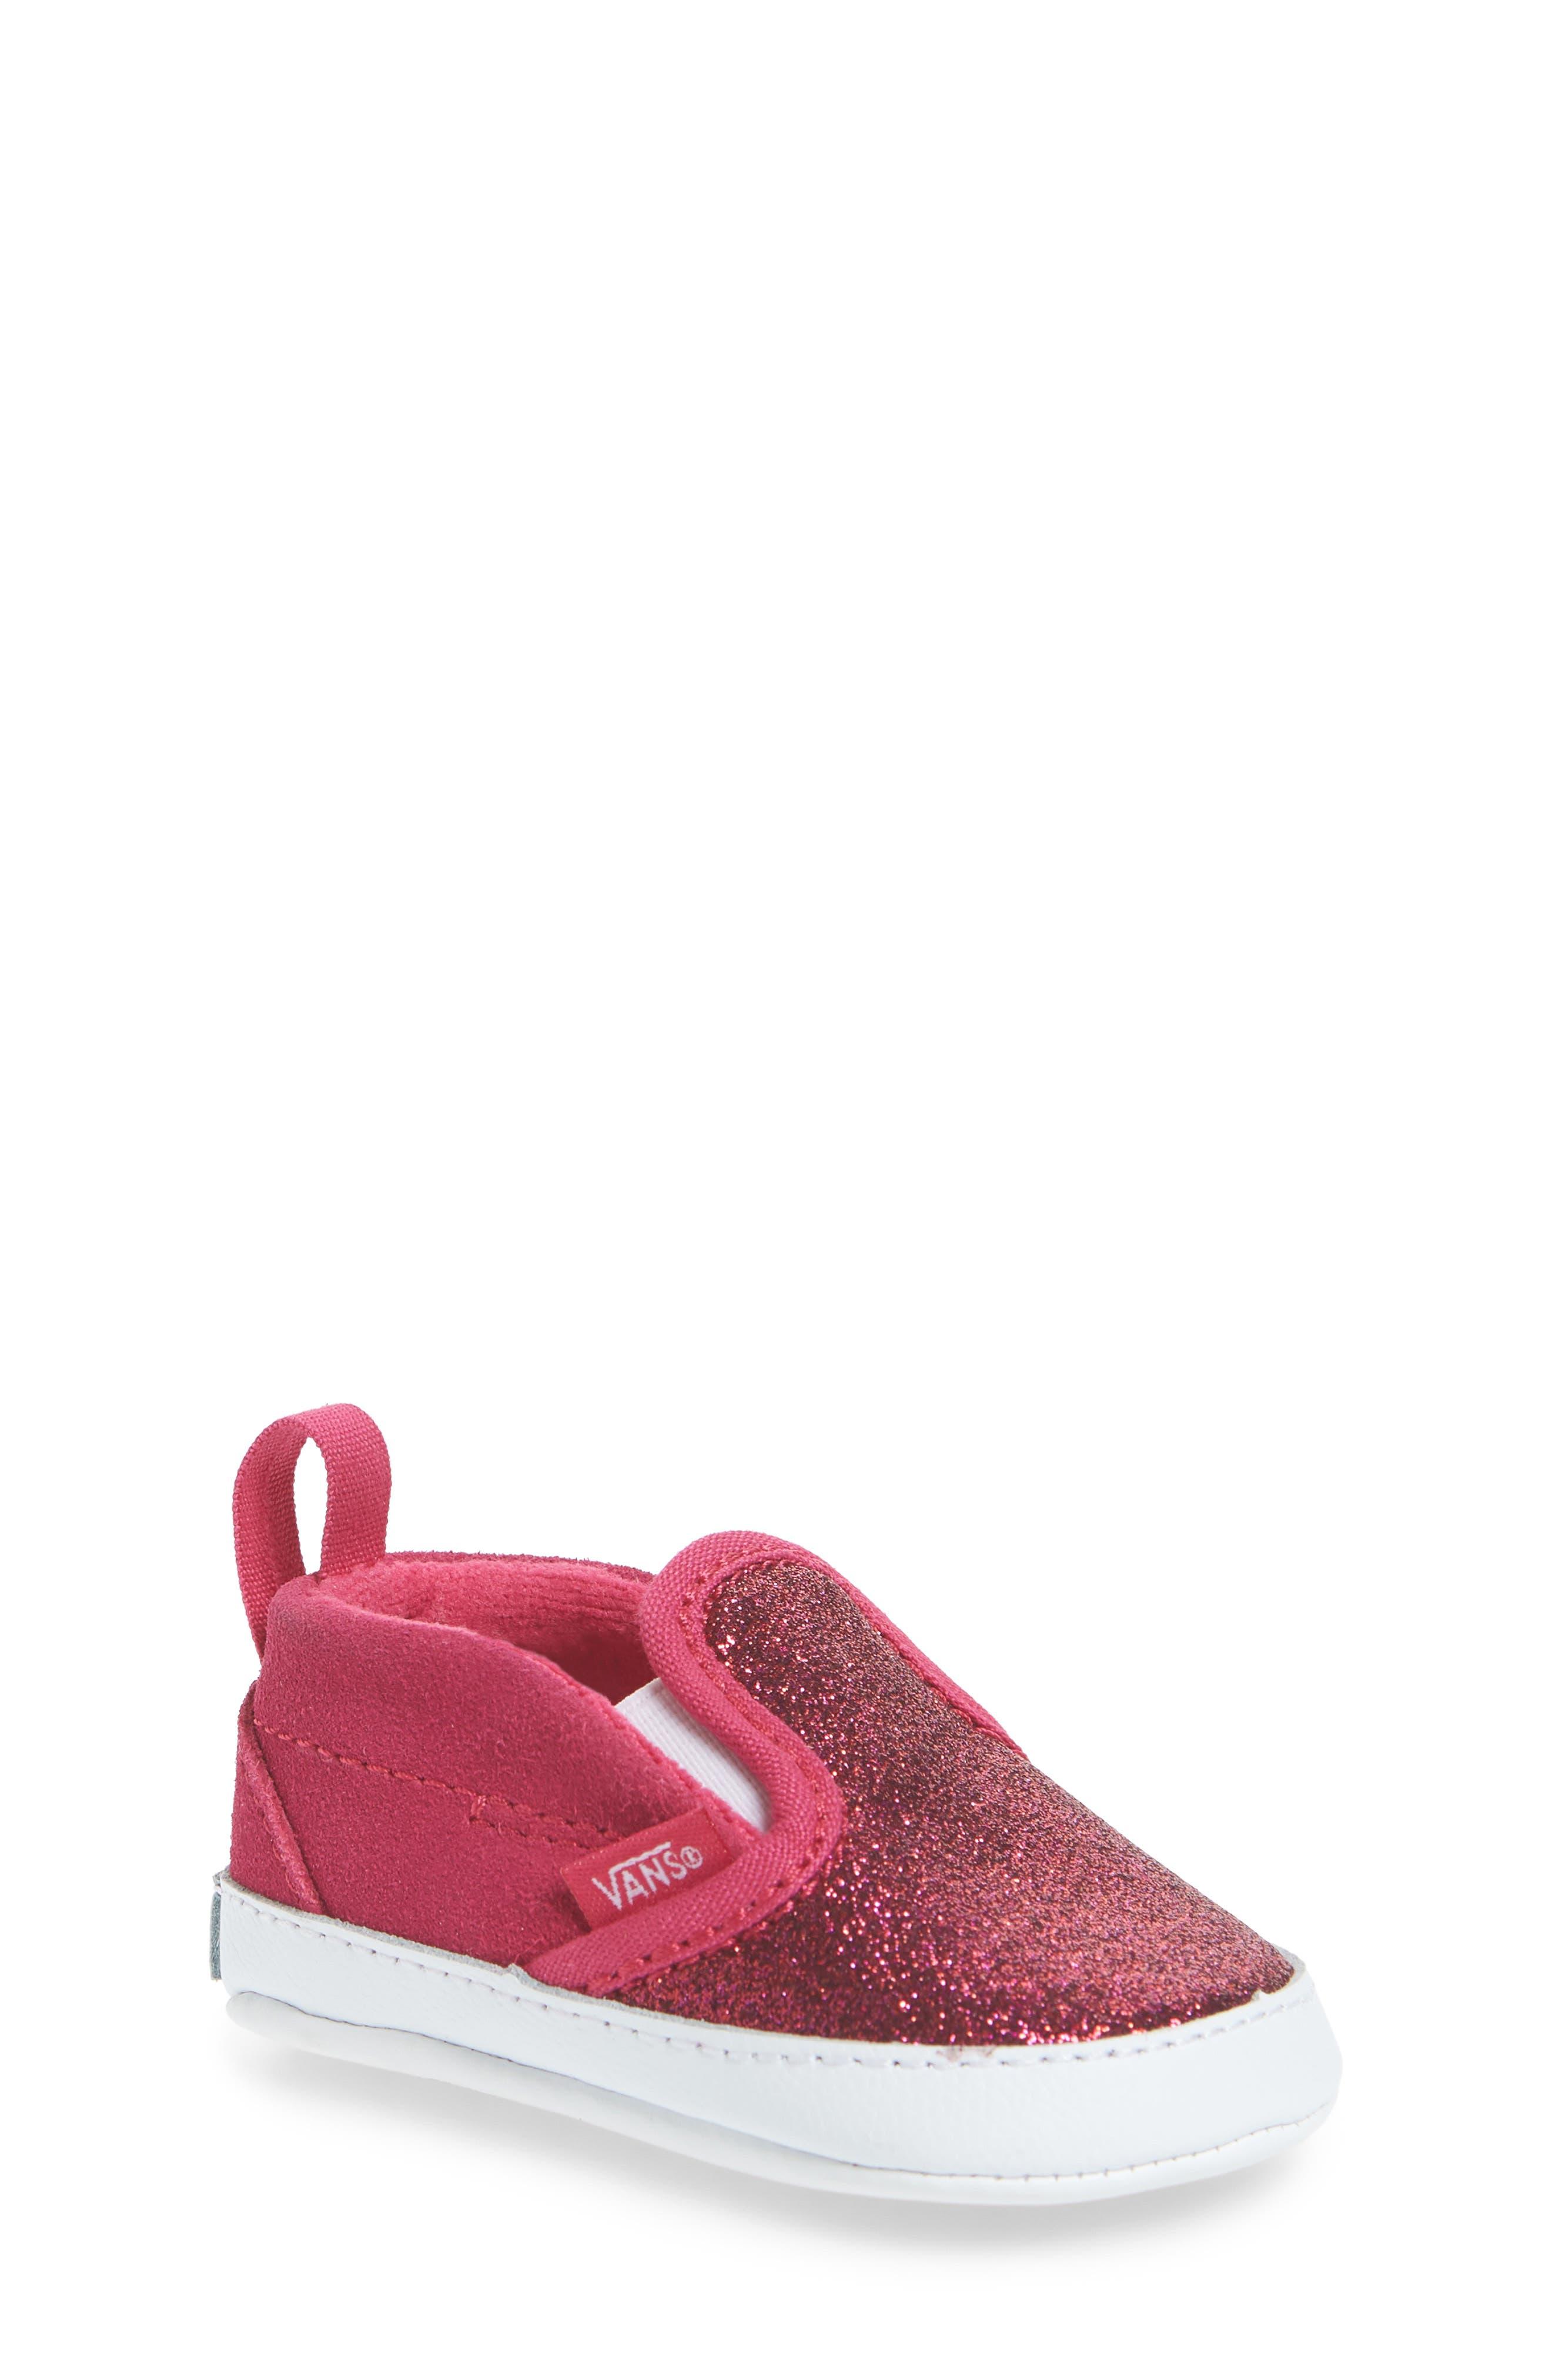 Vans Glitter Crib Shoe (Baby)